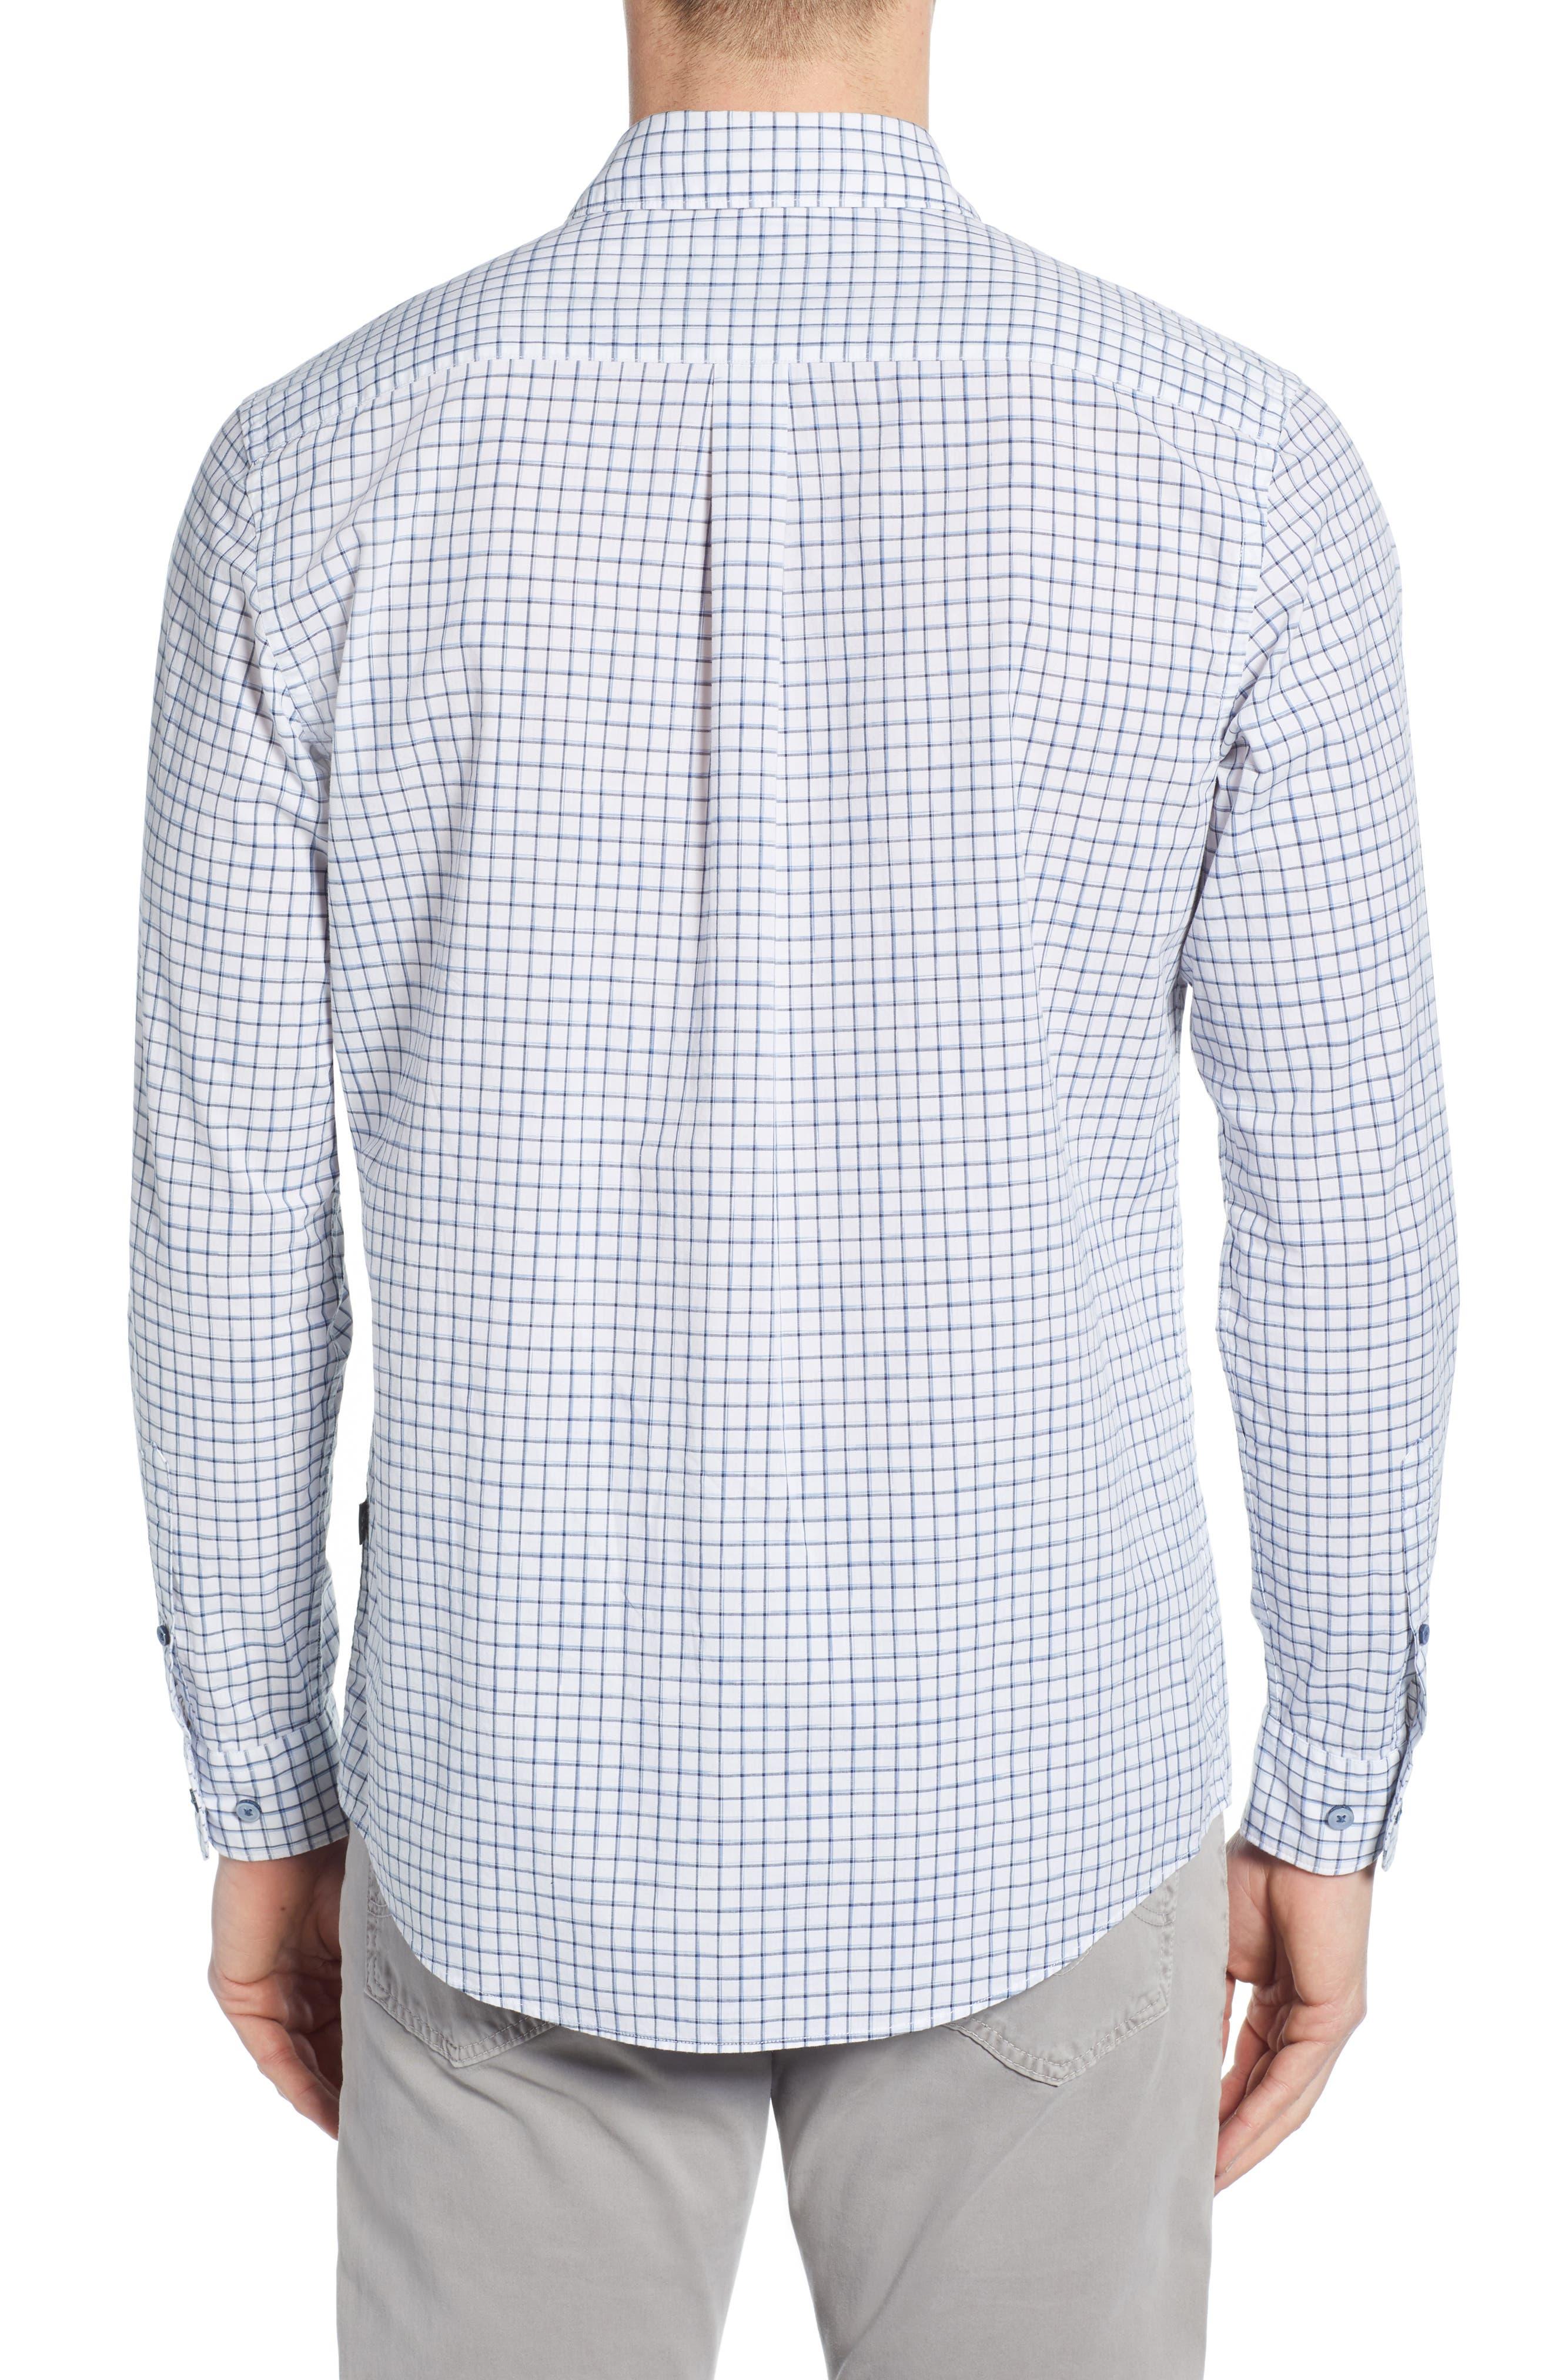 RODD & GUNN, Gowerville Regular Fit Check Sport Shirt, Alternate thumbnail 3, color, SNOW